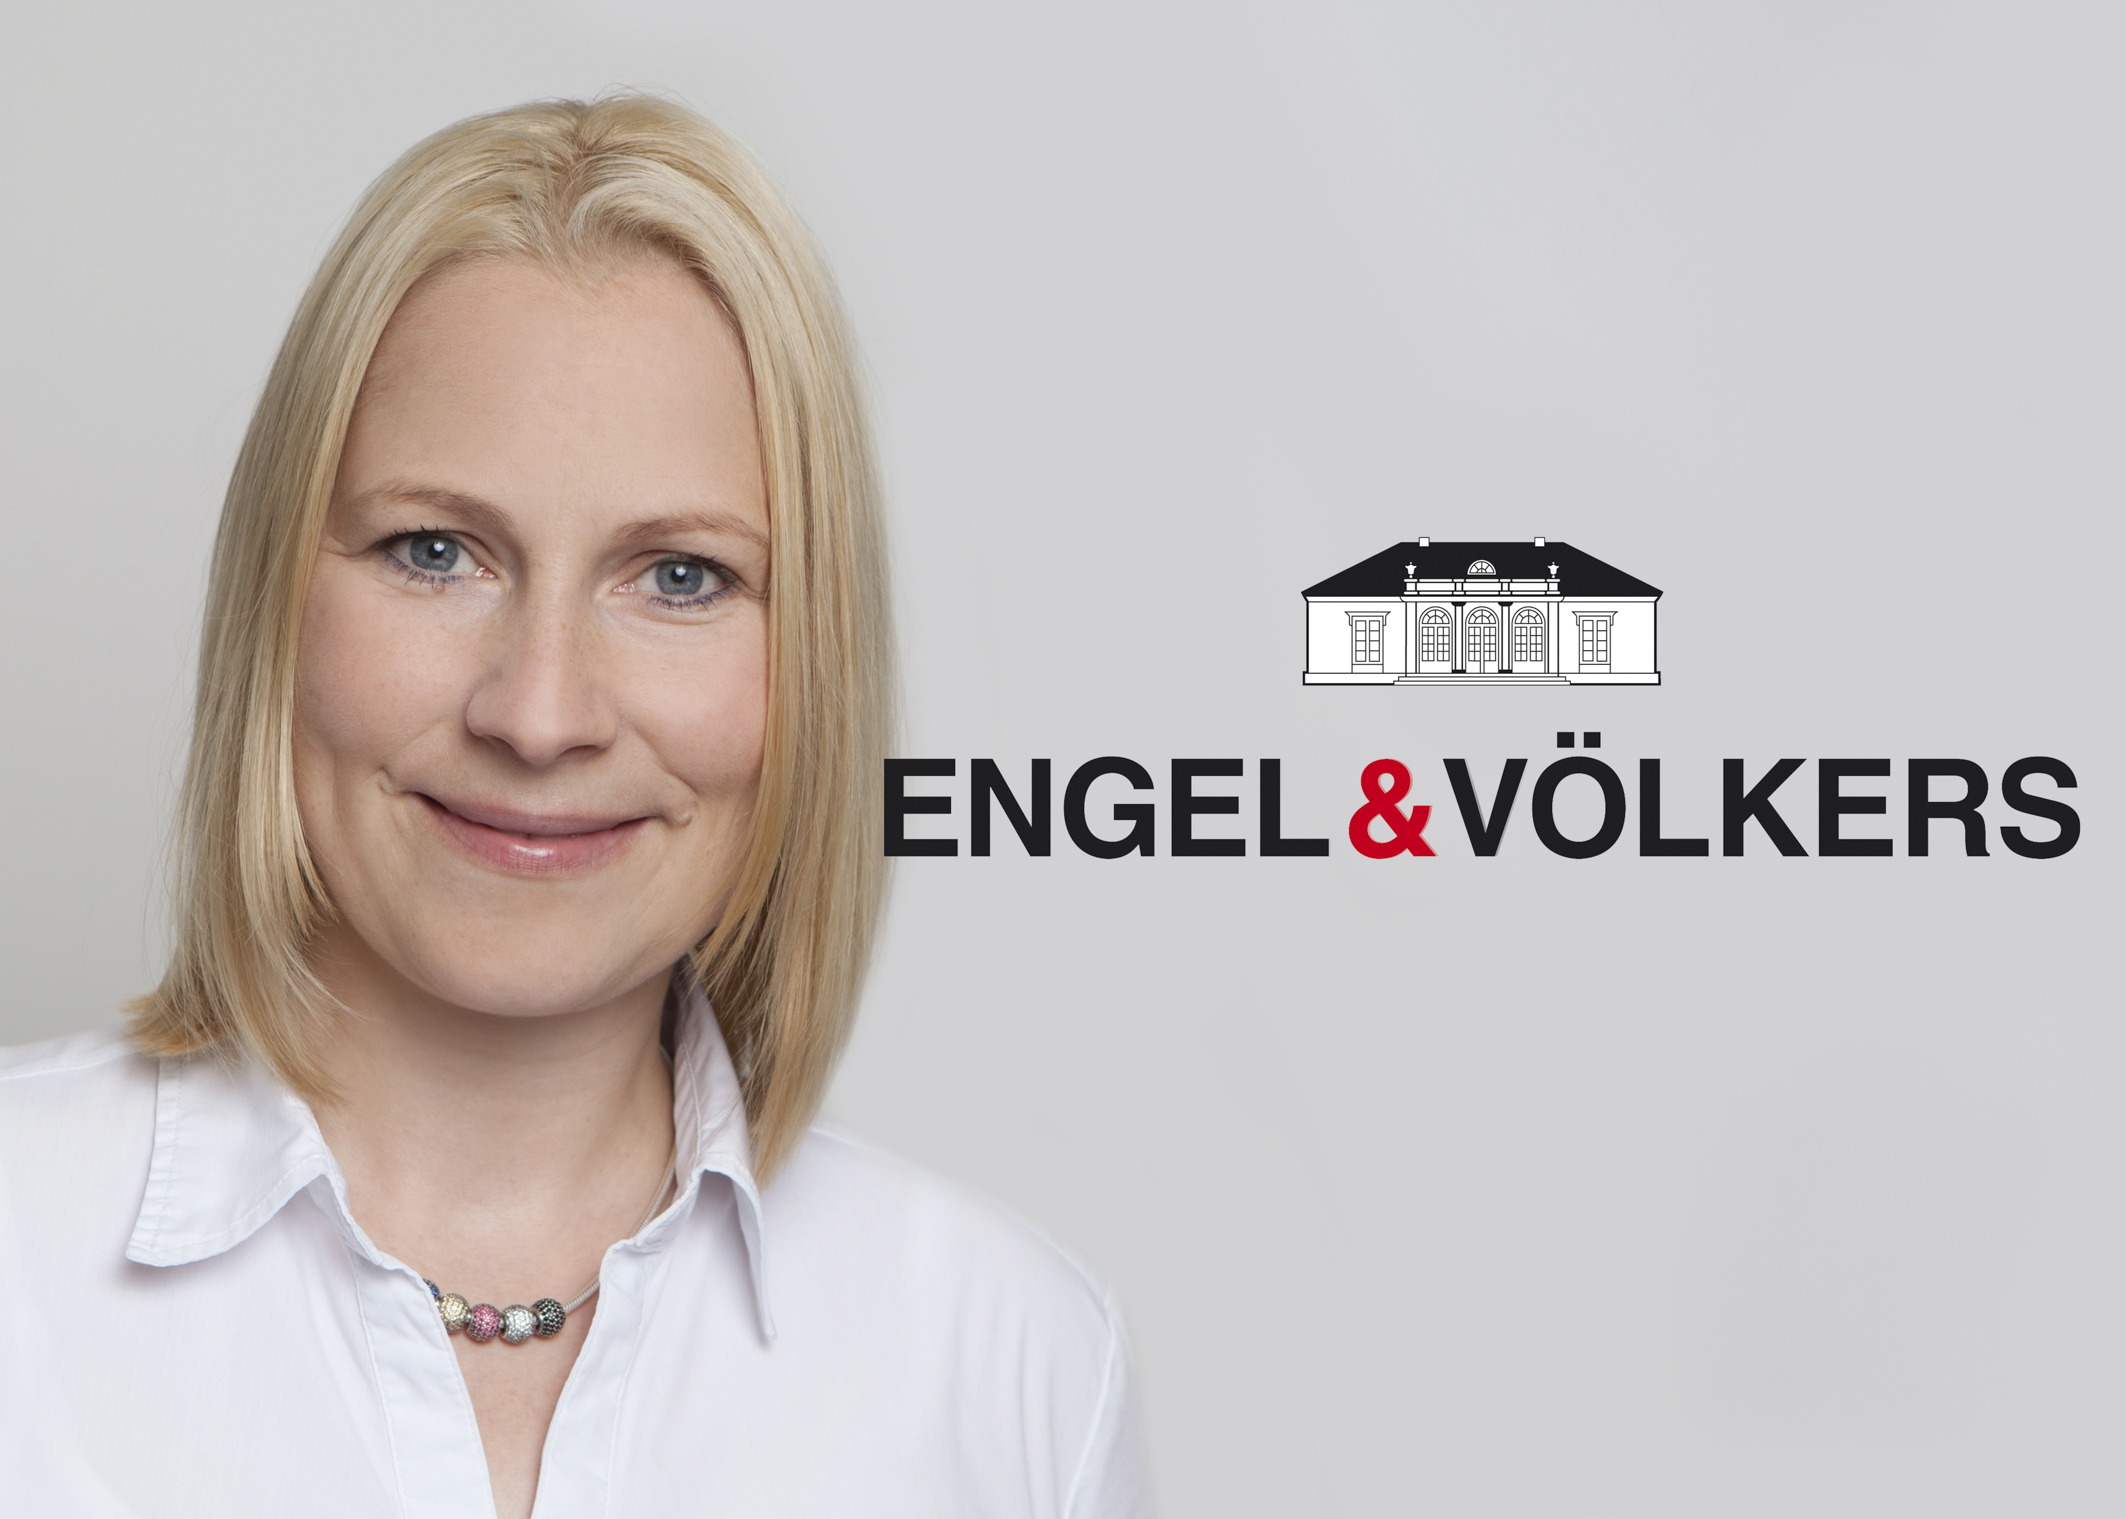 Engel v lkers verden - Engel and wolkers ...